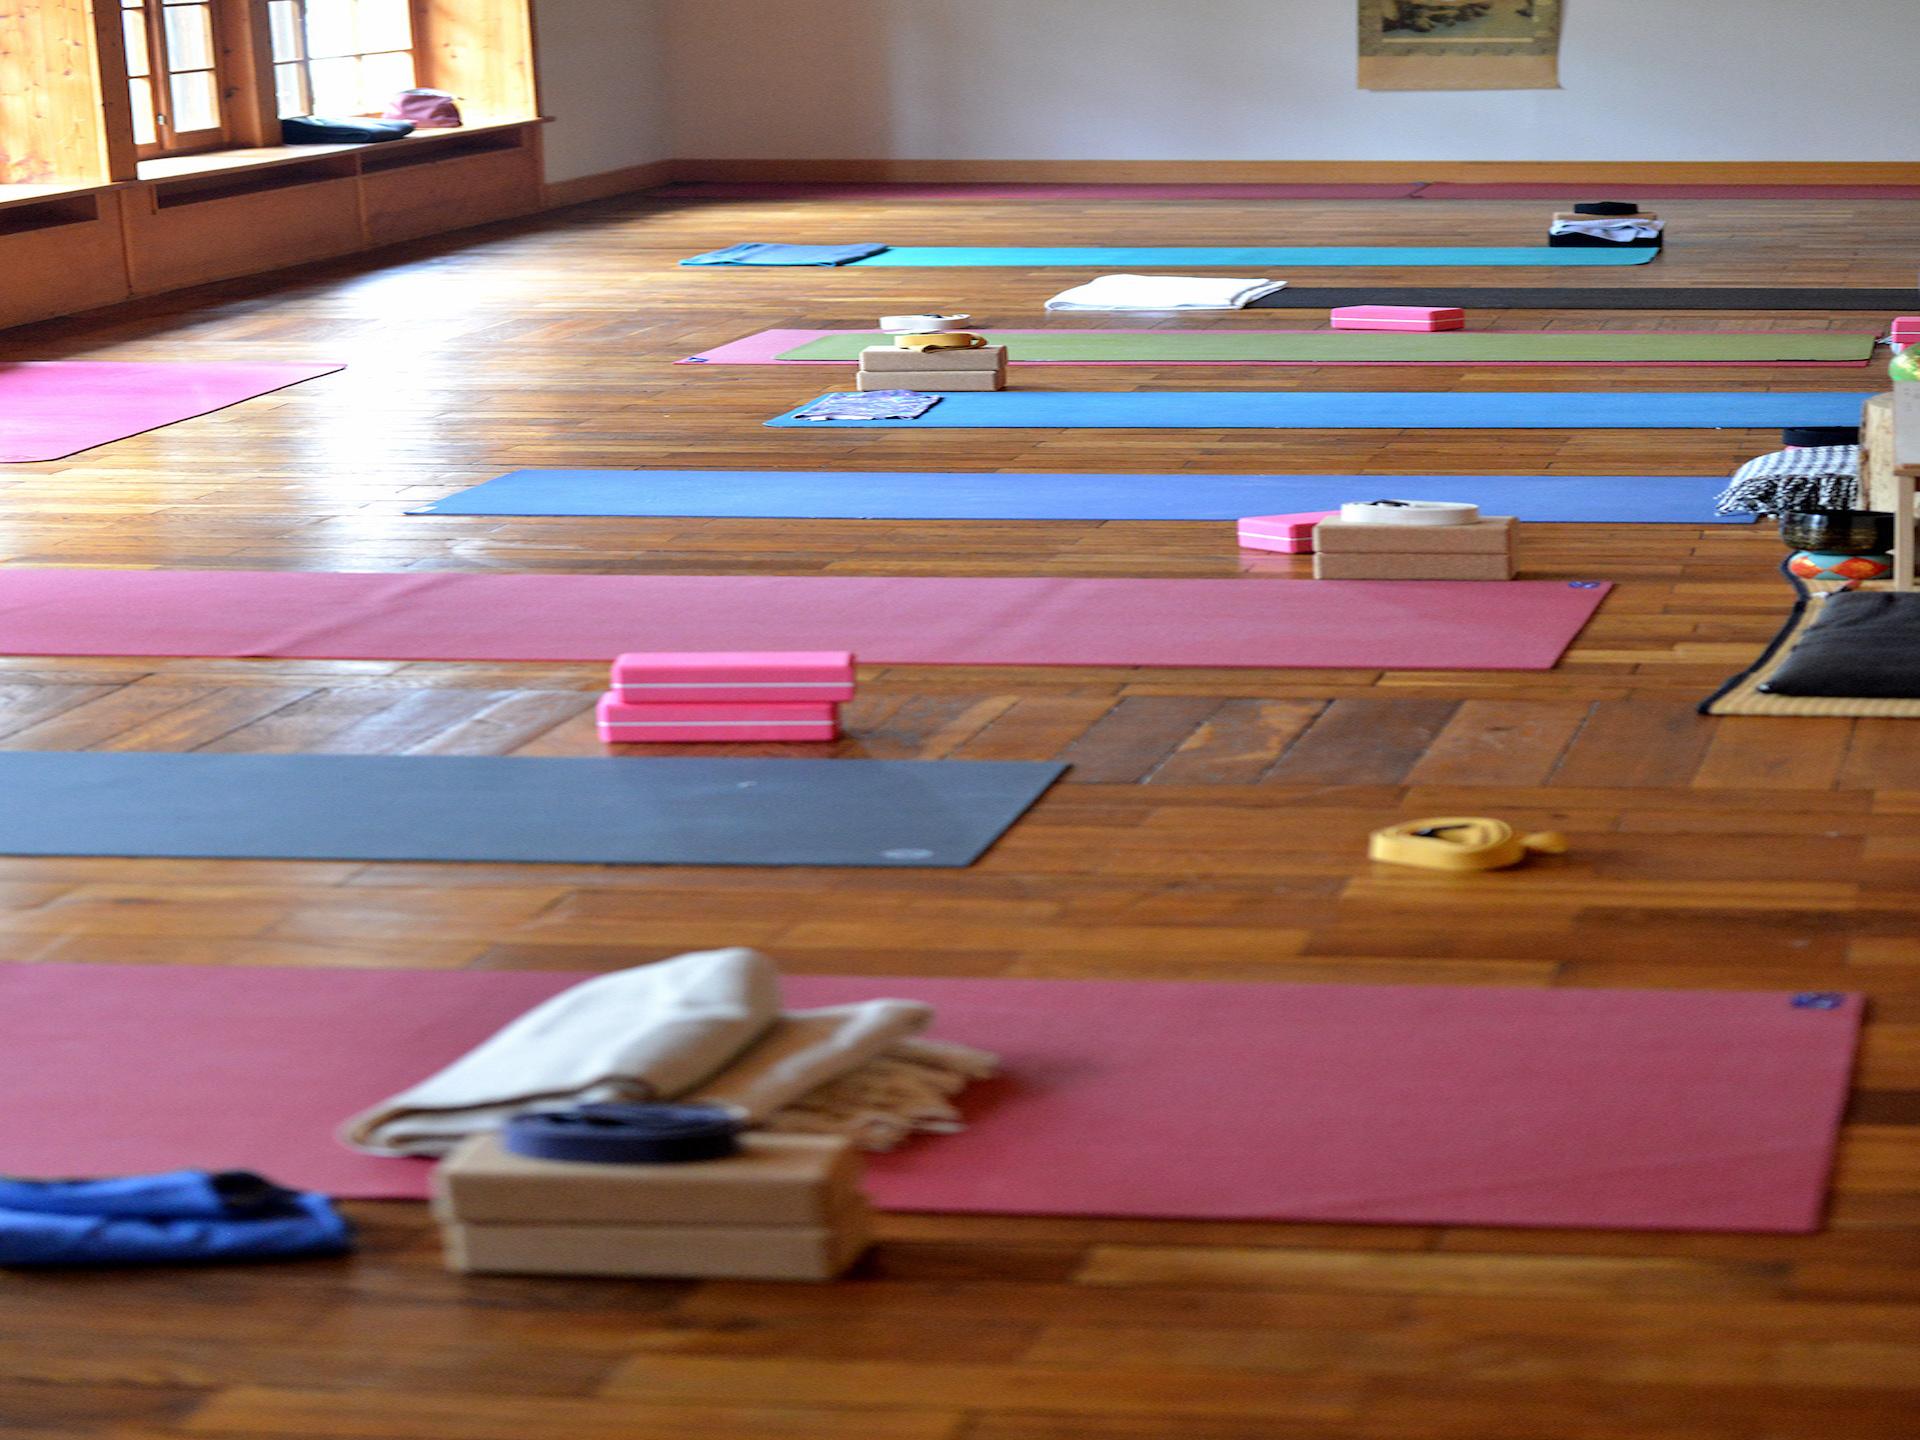 zen zazen meditation dharma sangha johanneshof buddhismus schwarzwald Yoga